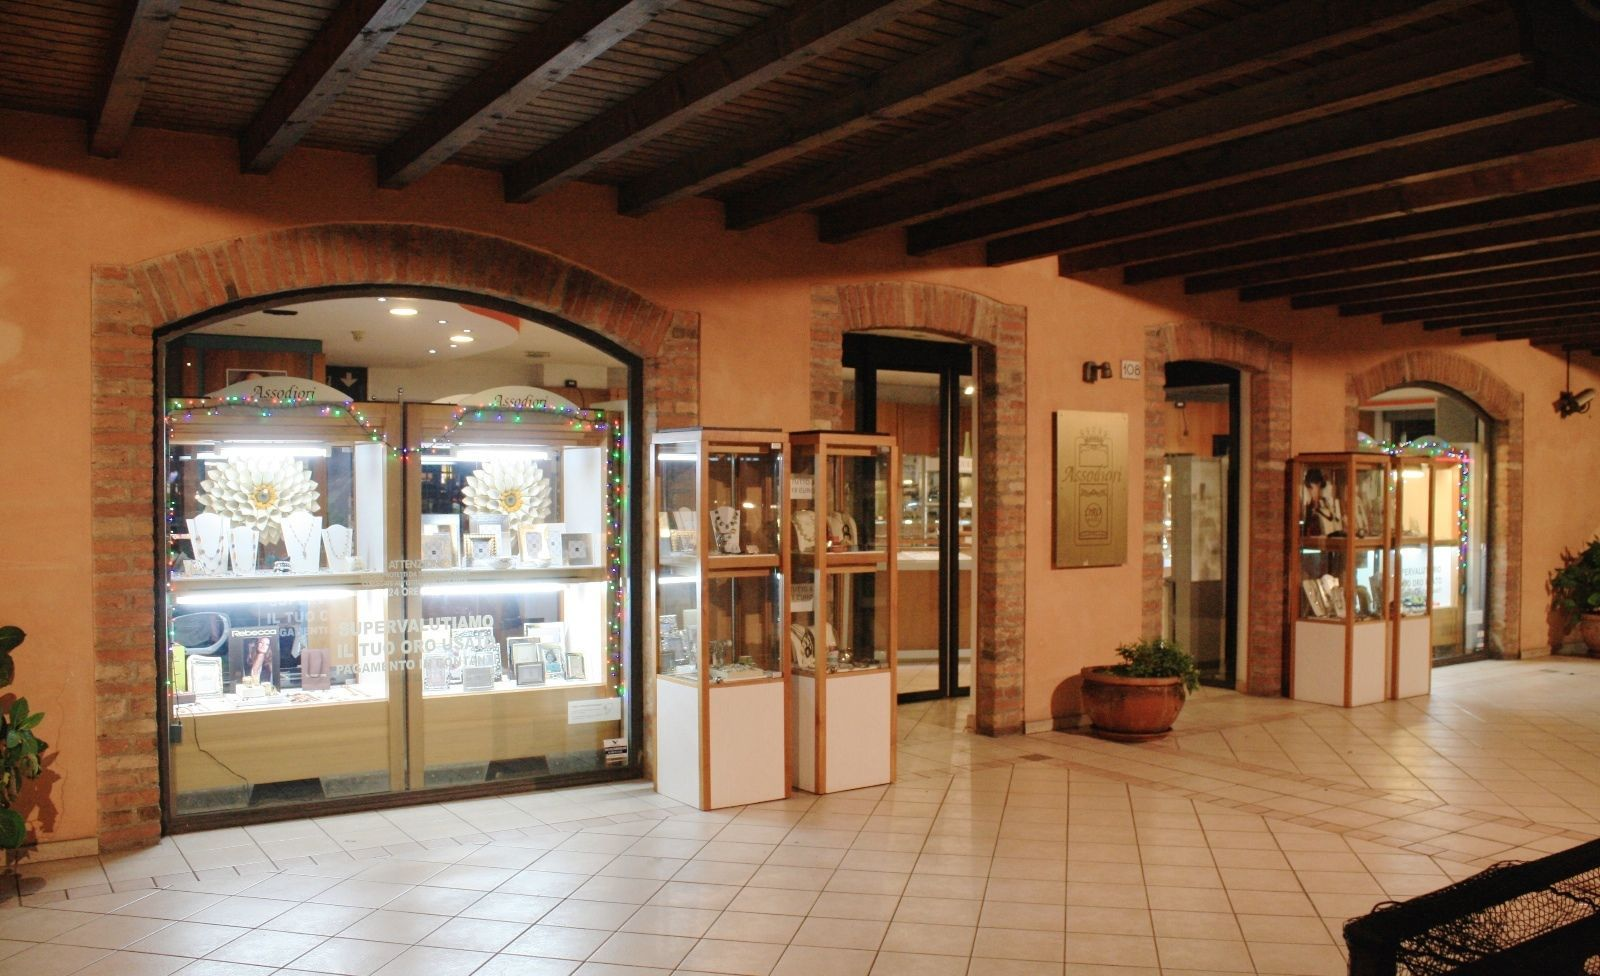 18K YELLOW GOLD GIRL CHARM PENDANT SMOOTH LUMINOUS BRIGHT ZIRCONIA MADE IN ITALY